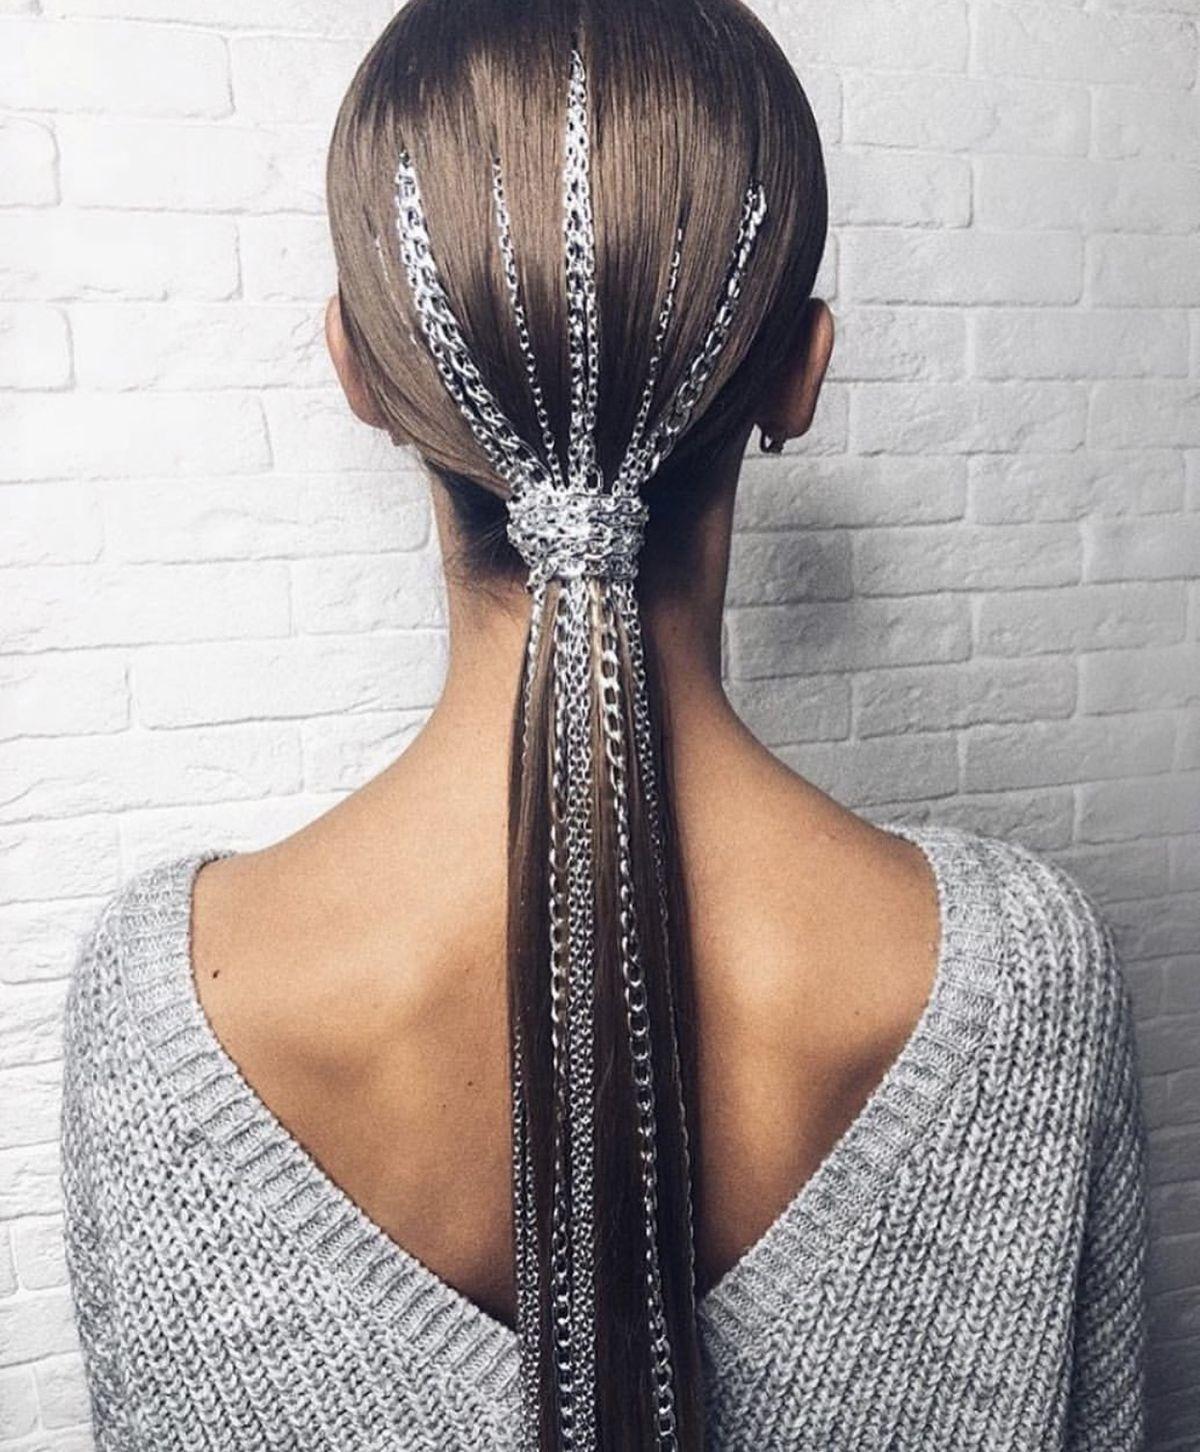 Hair Inspiration 2019-05-29 21:30:47